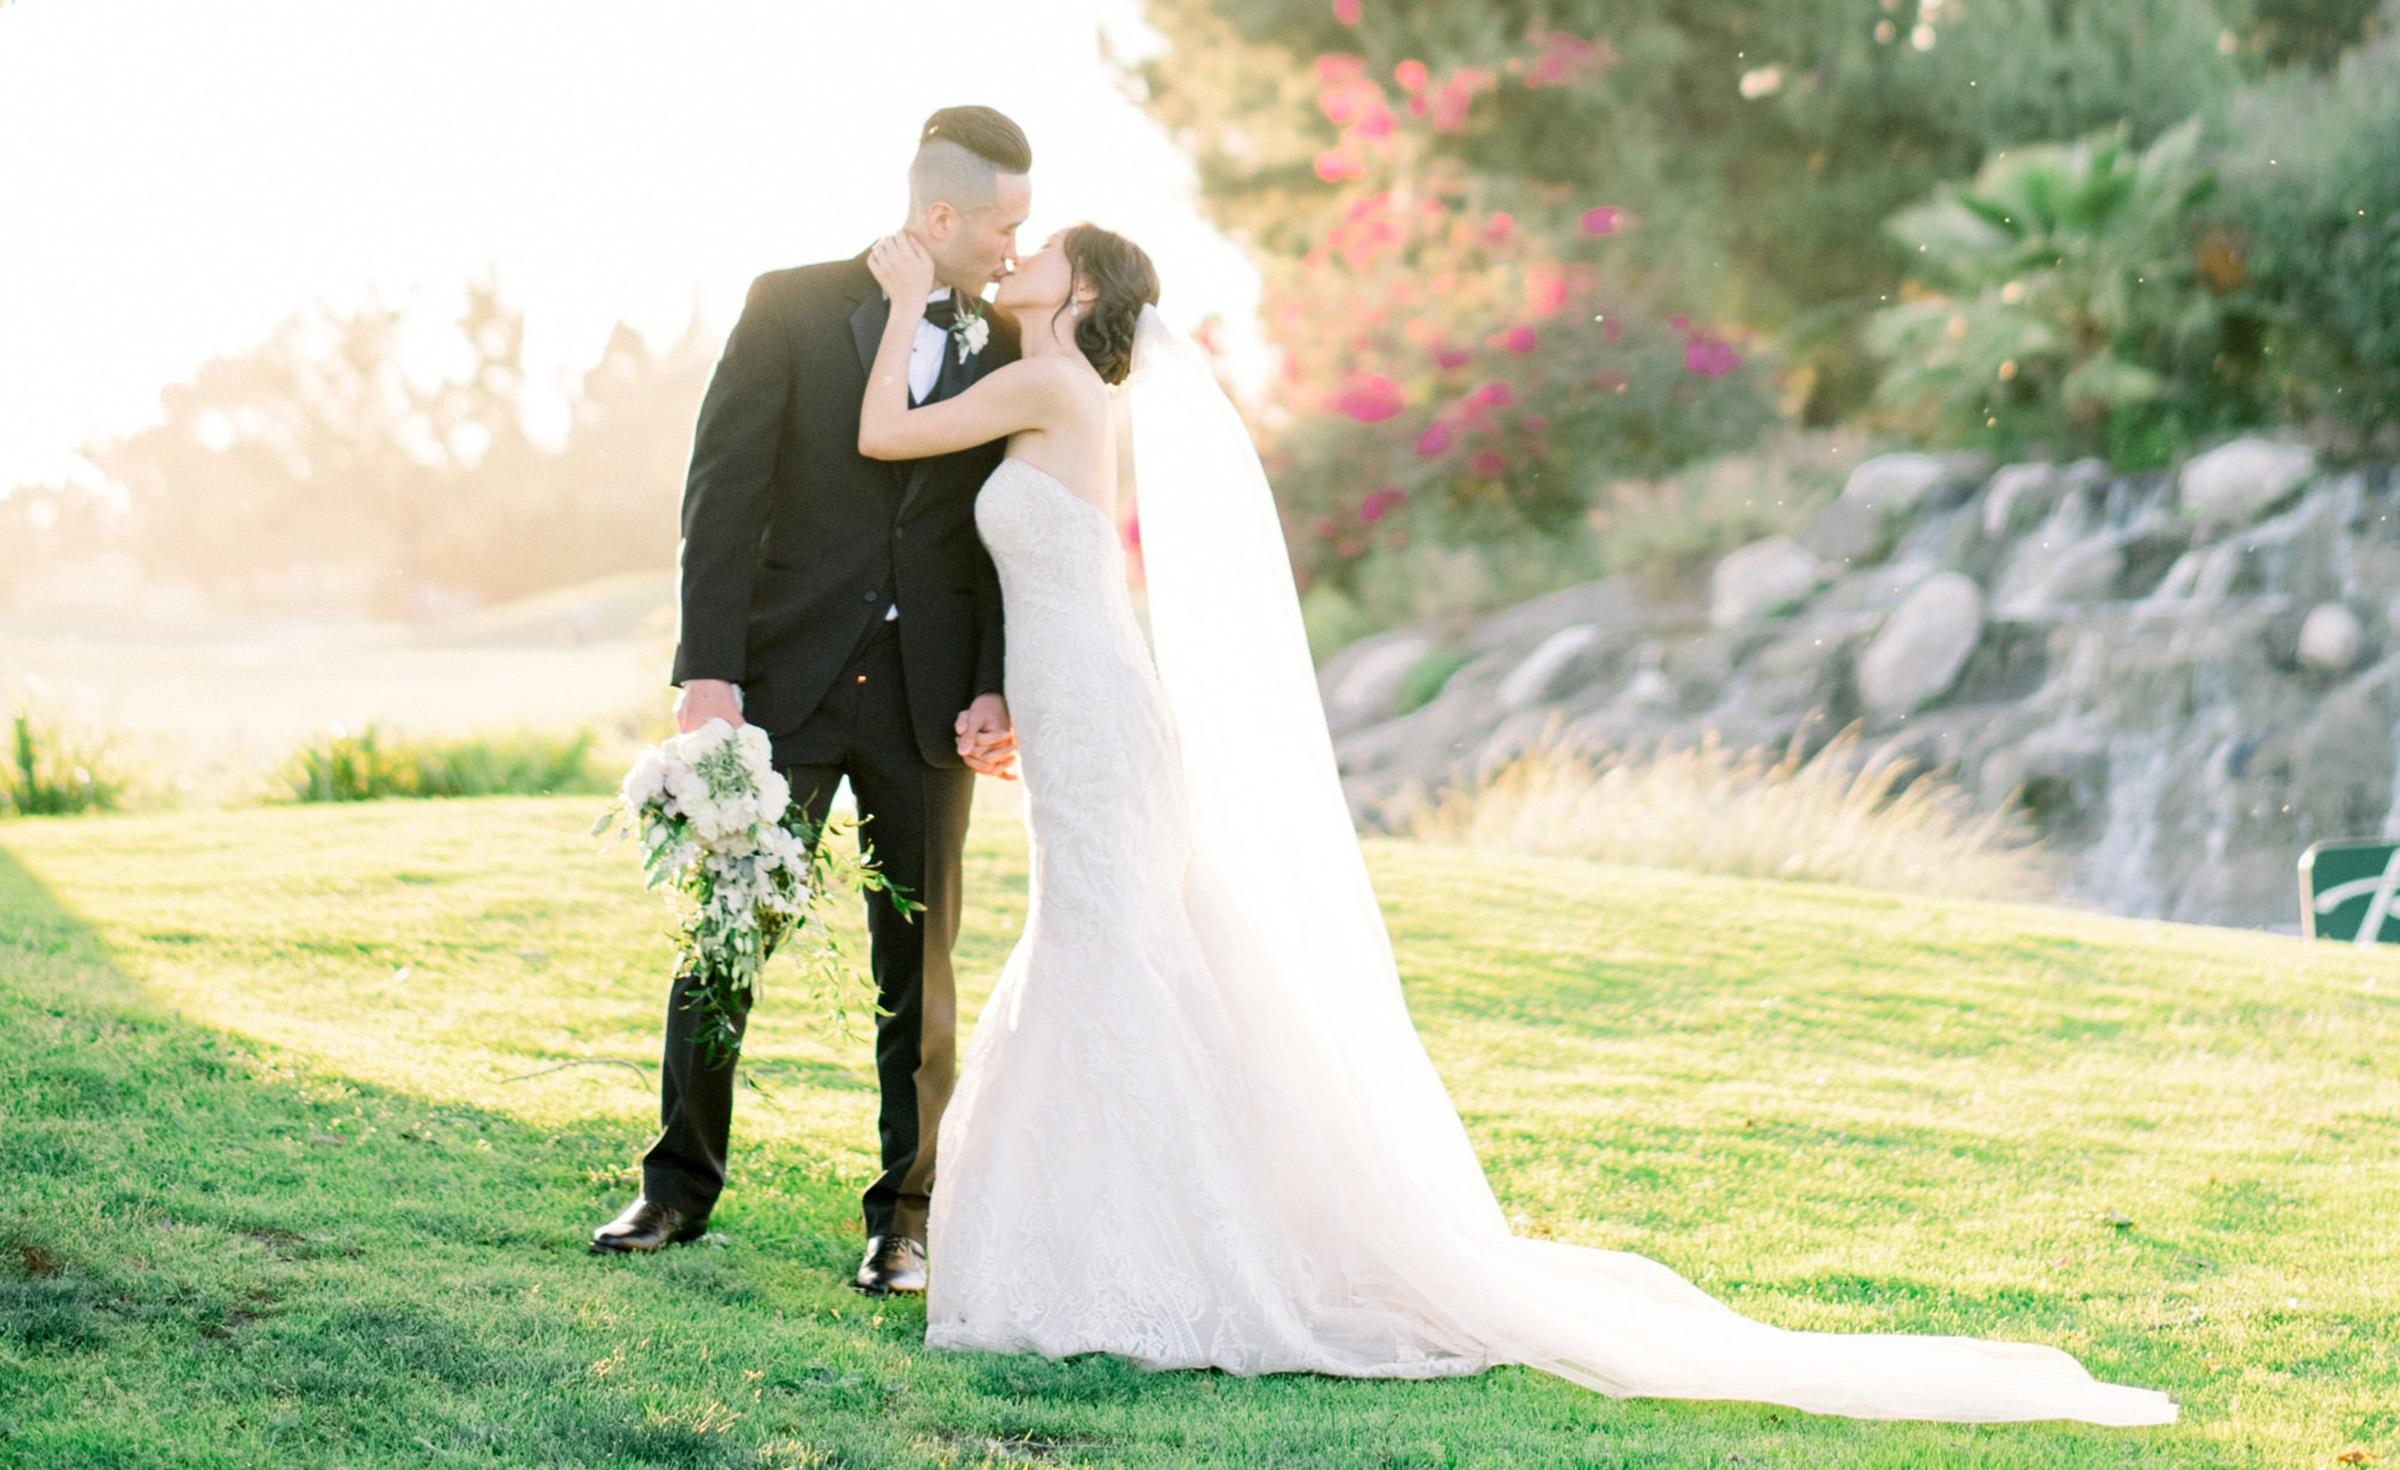 Newlyweds - Rio Hondo - Downey, California - Los Angeles County - Wedgewood  Weddings